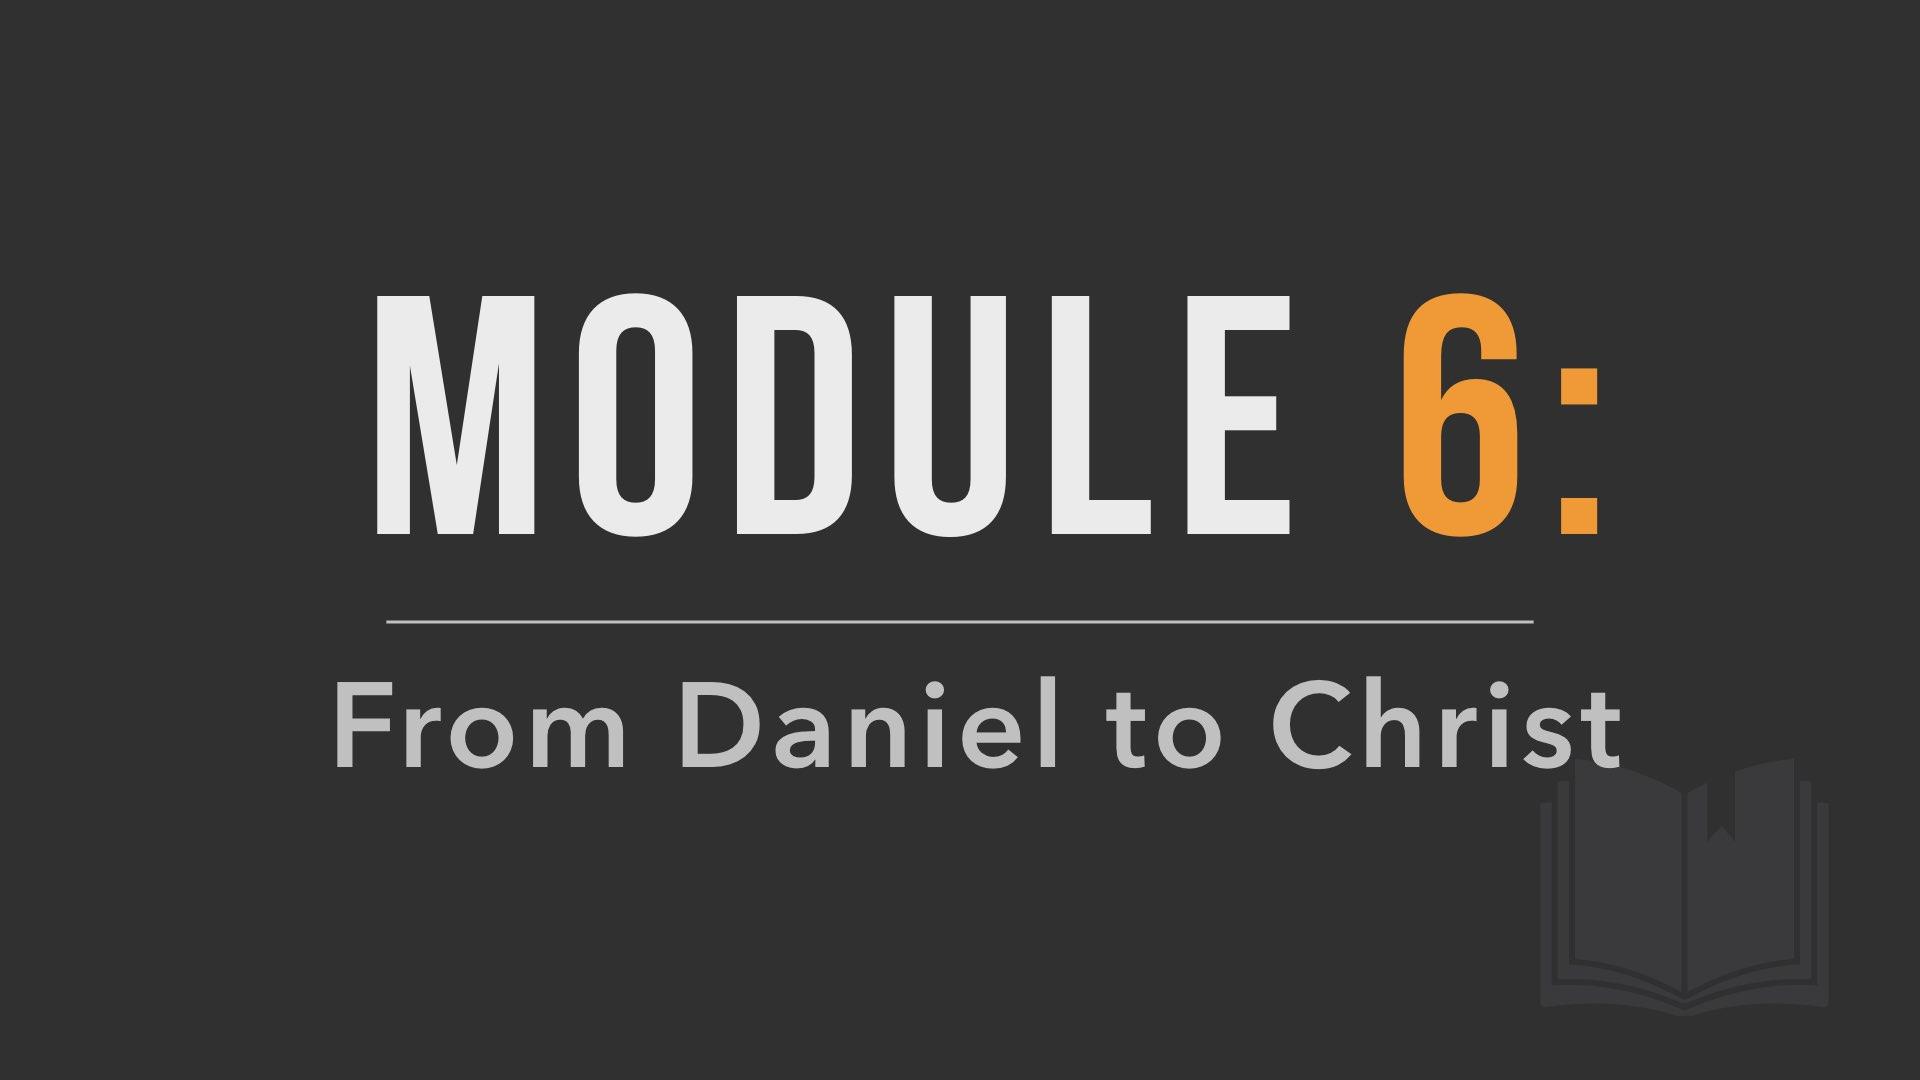 Module 6 Poster Image